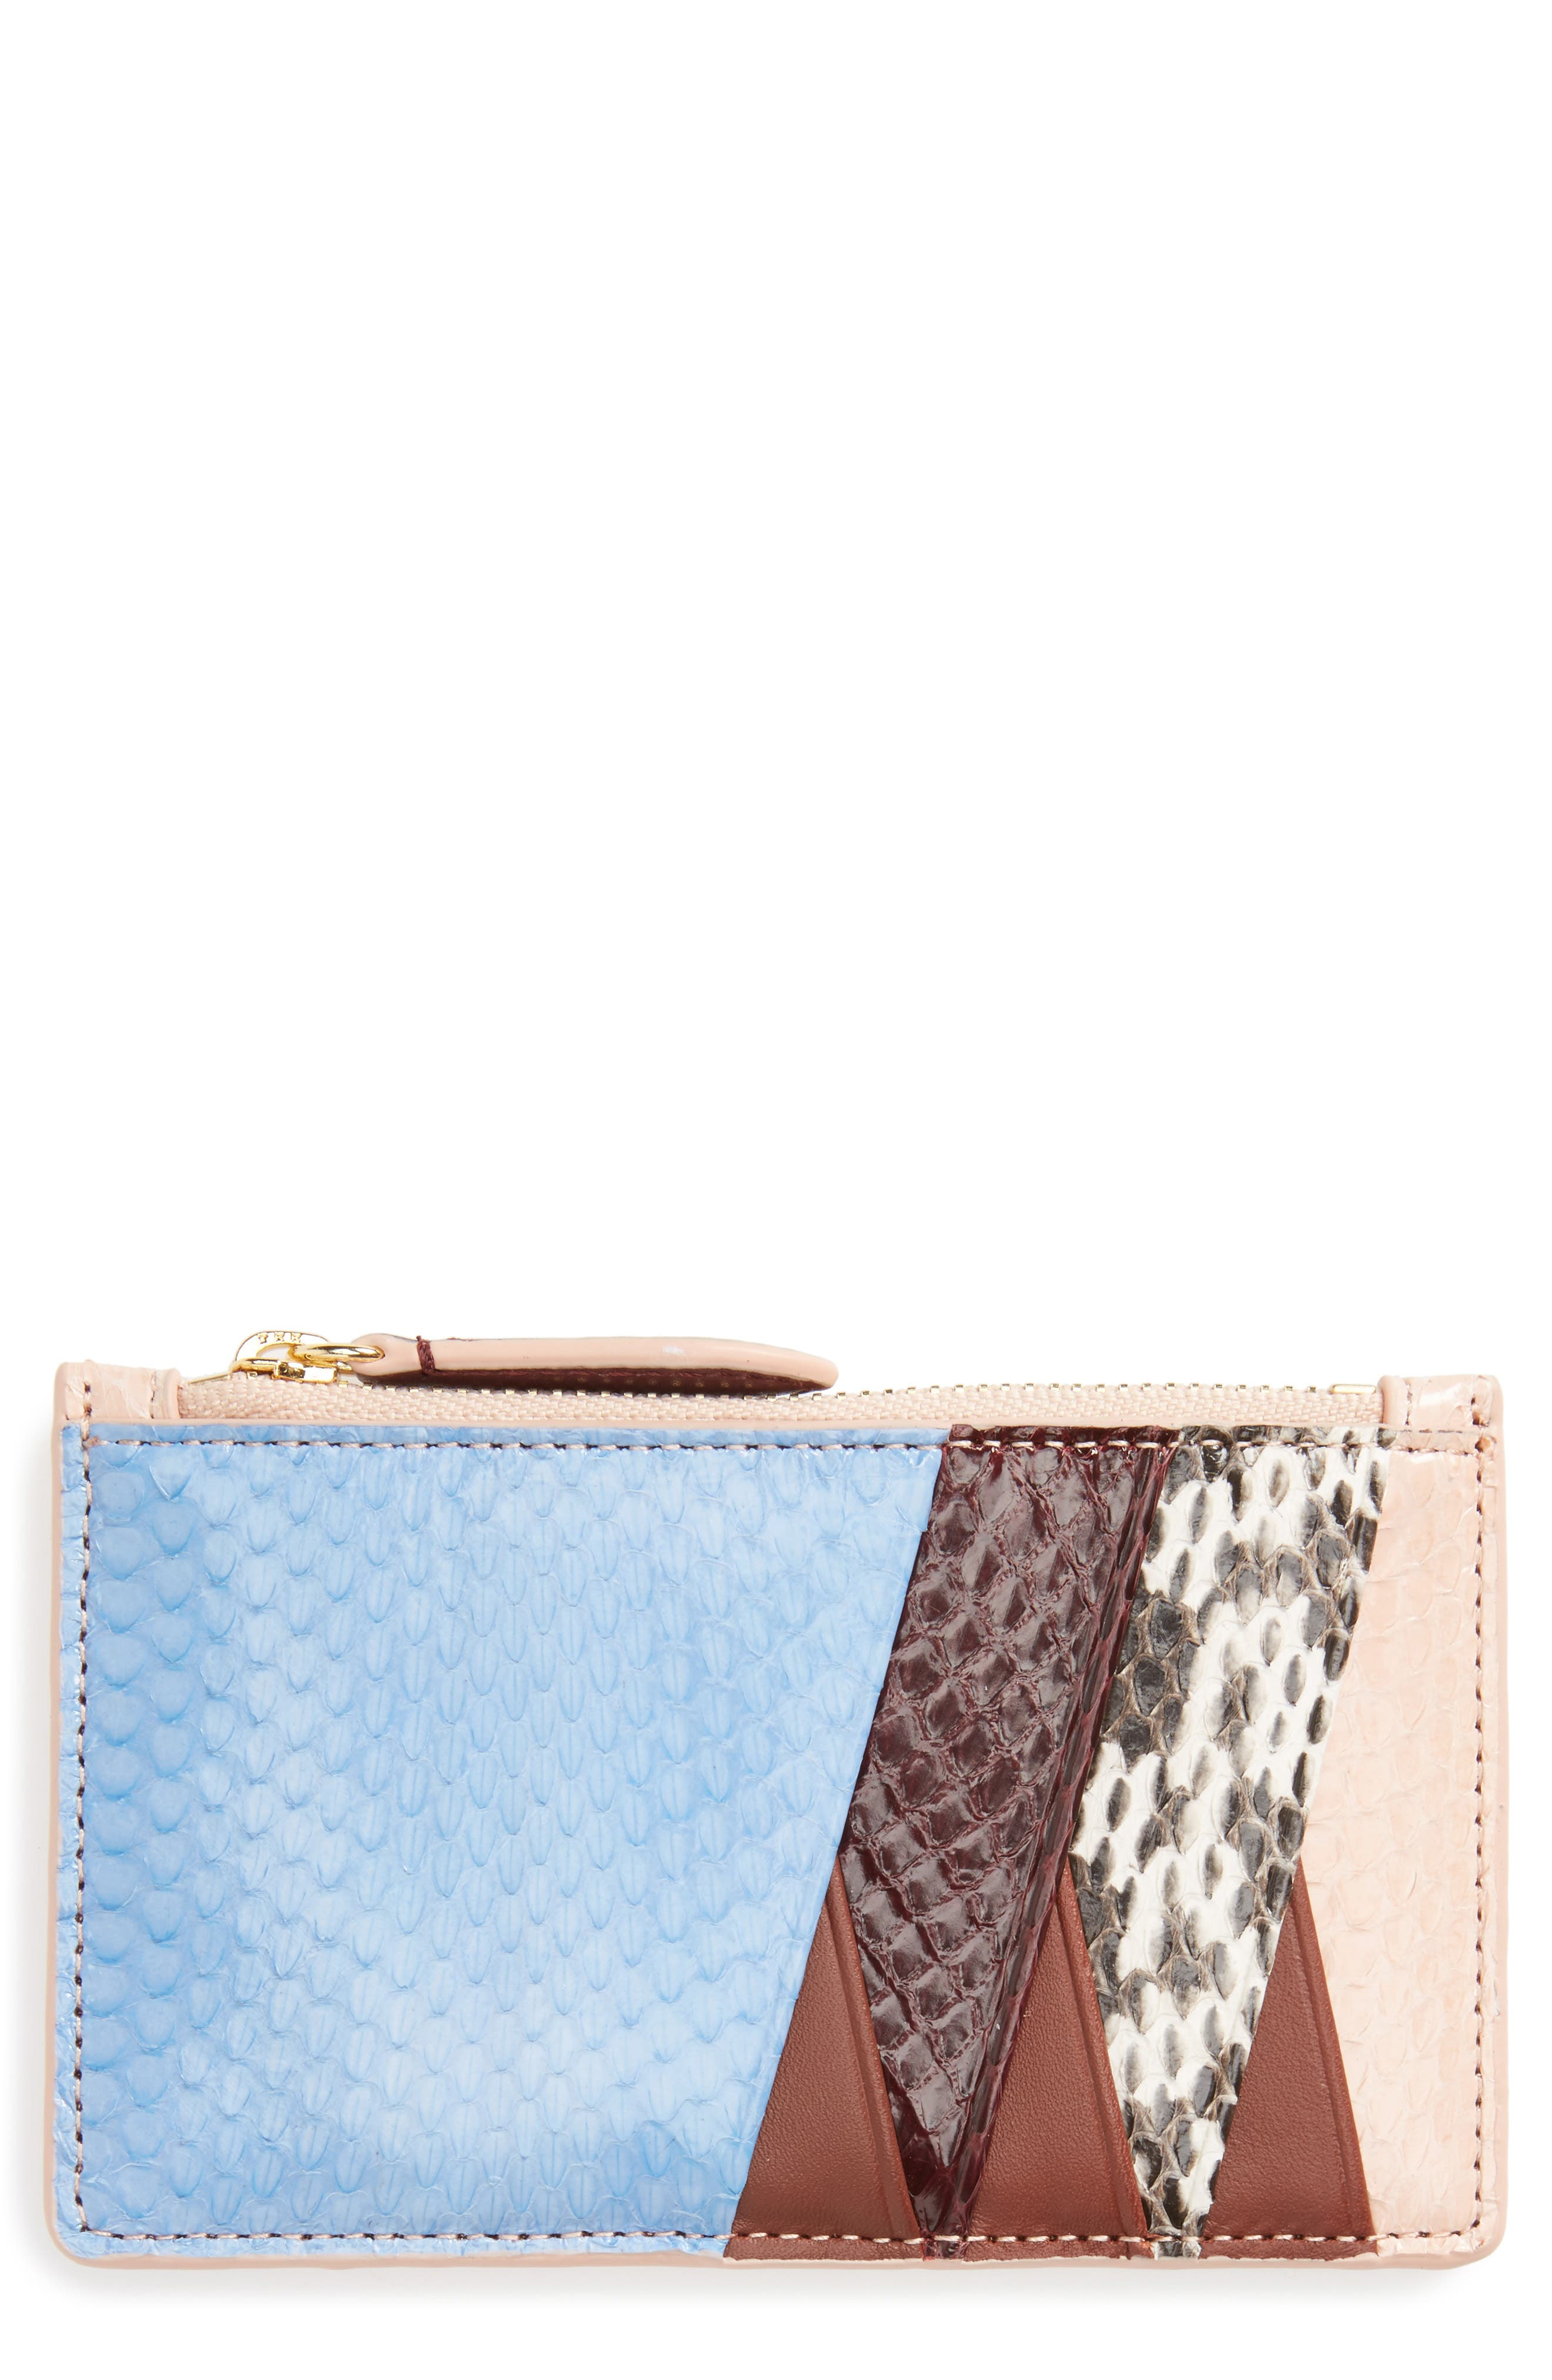 Alternate Image 1 Selected - Diane von Furstenberg Genuine Snakeskin & Leather Card Case